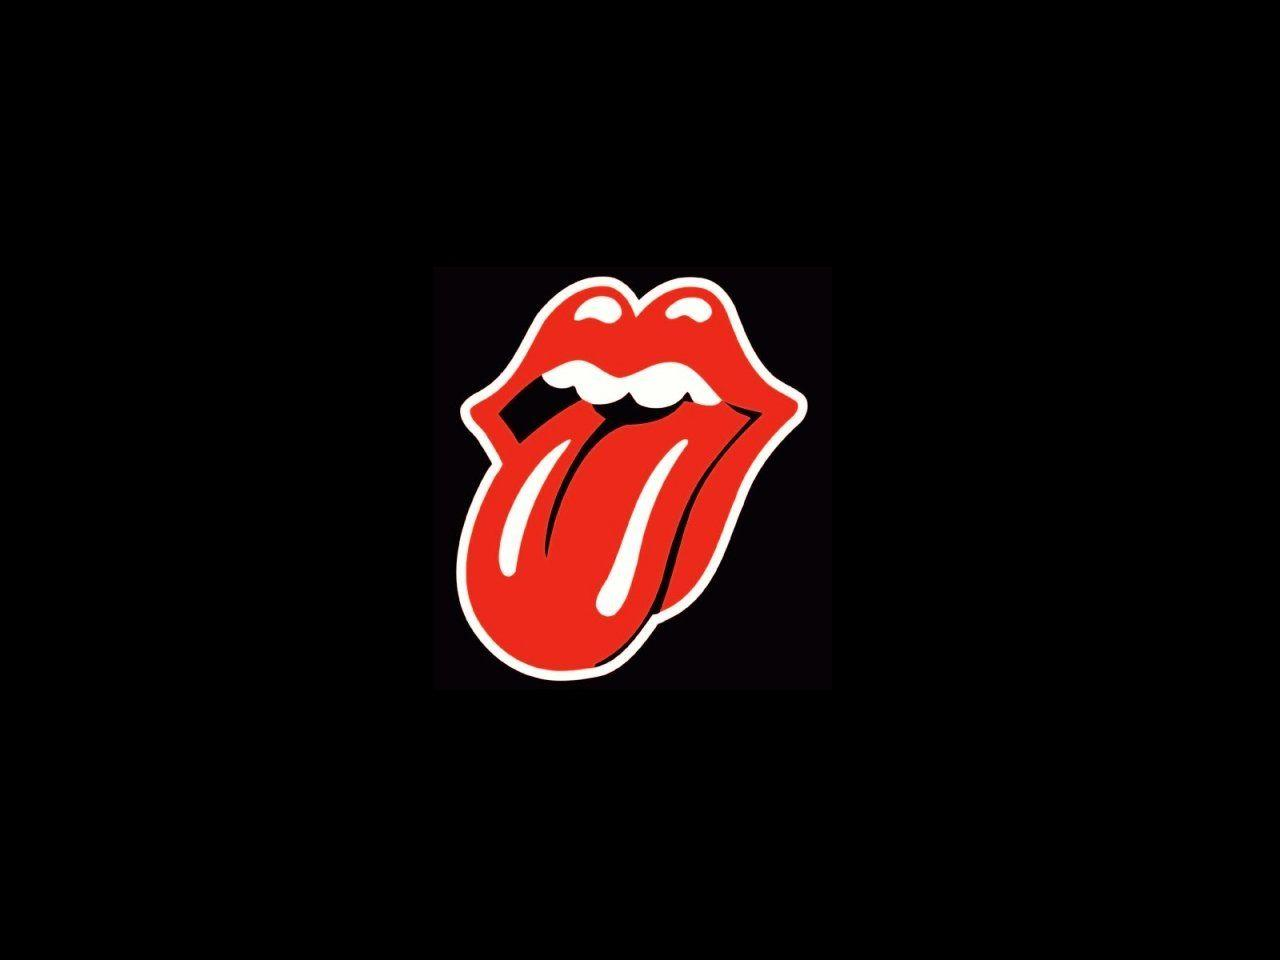 Rolling Stones Wallpapers 1280x960